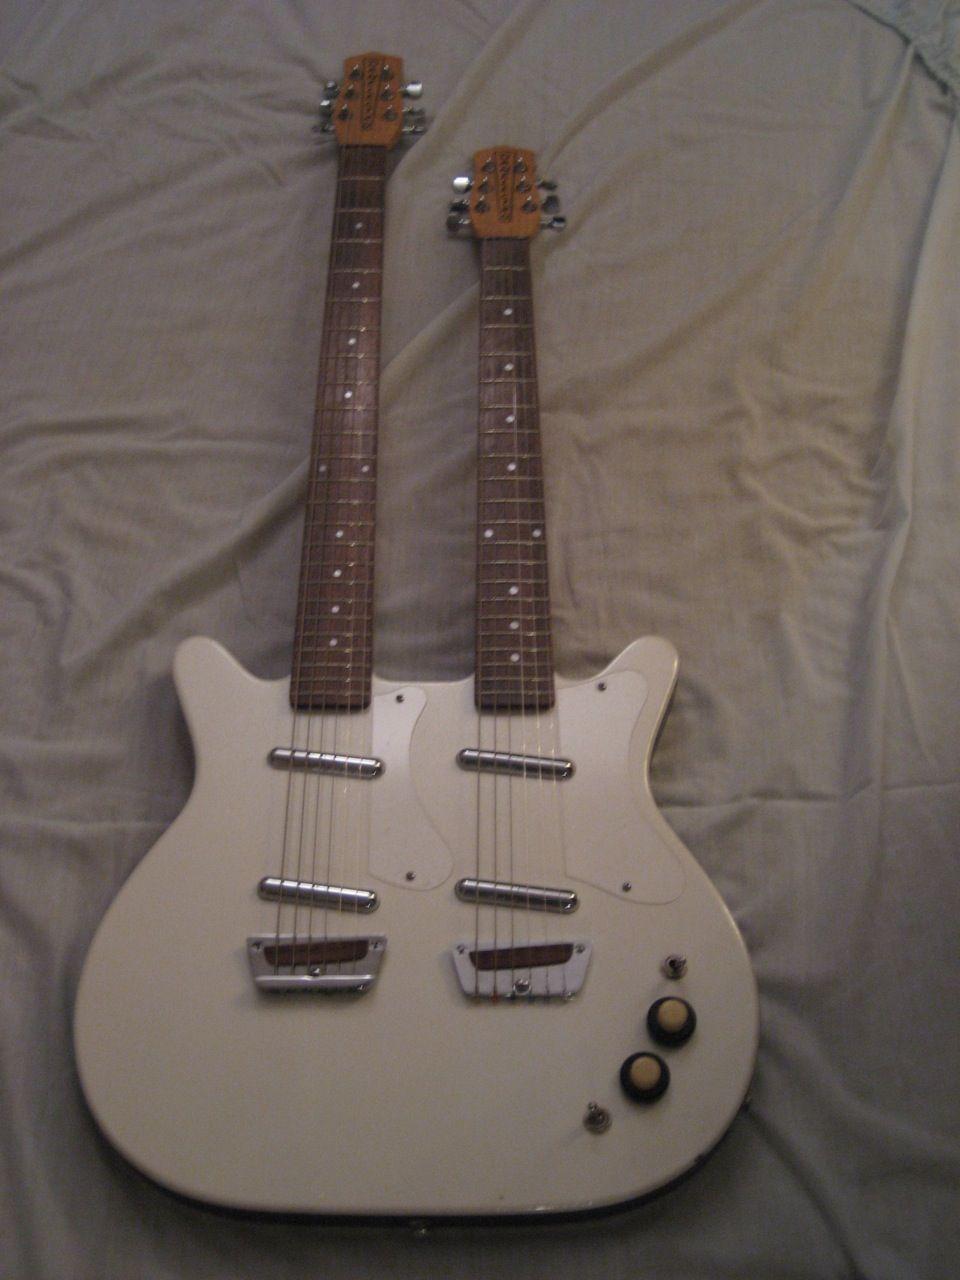 Danelectro Baritone 3 dual neck | Guitar, Guitar pics ...